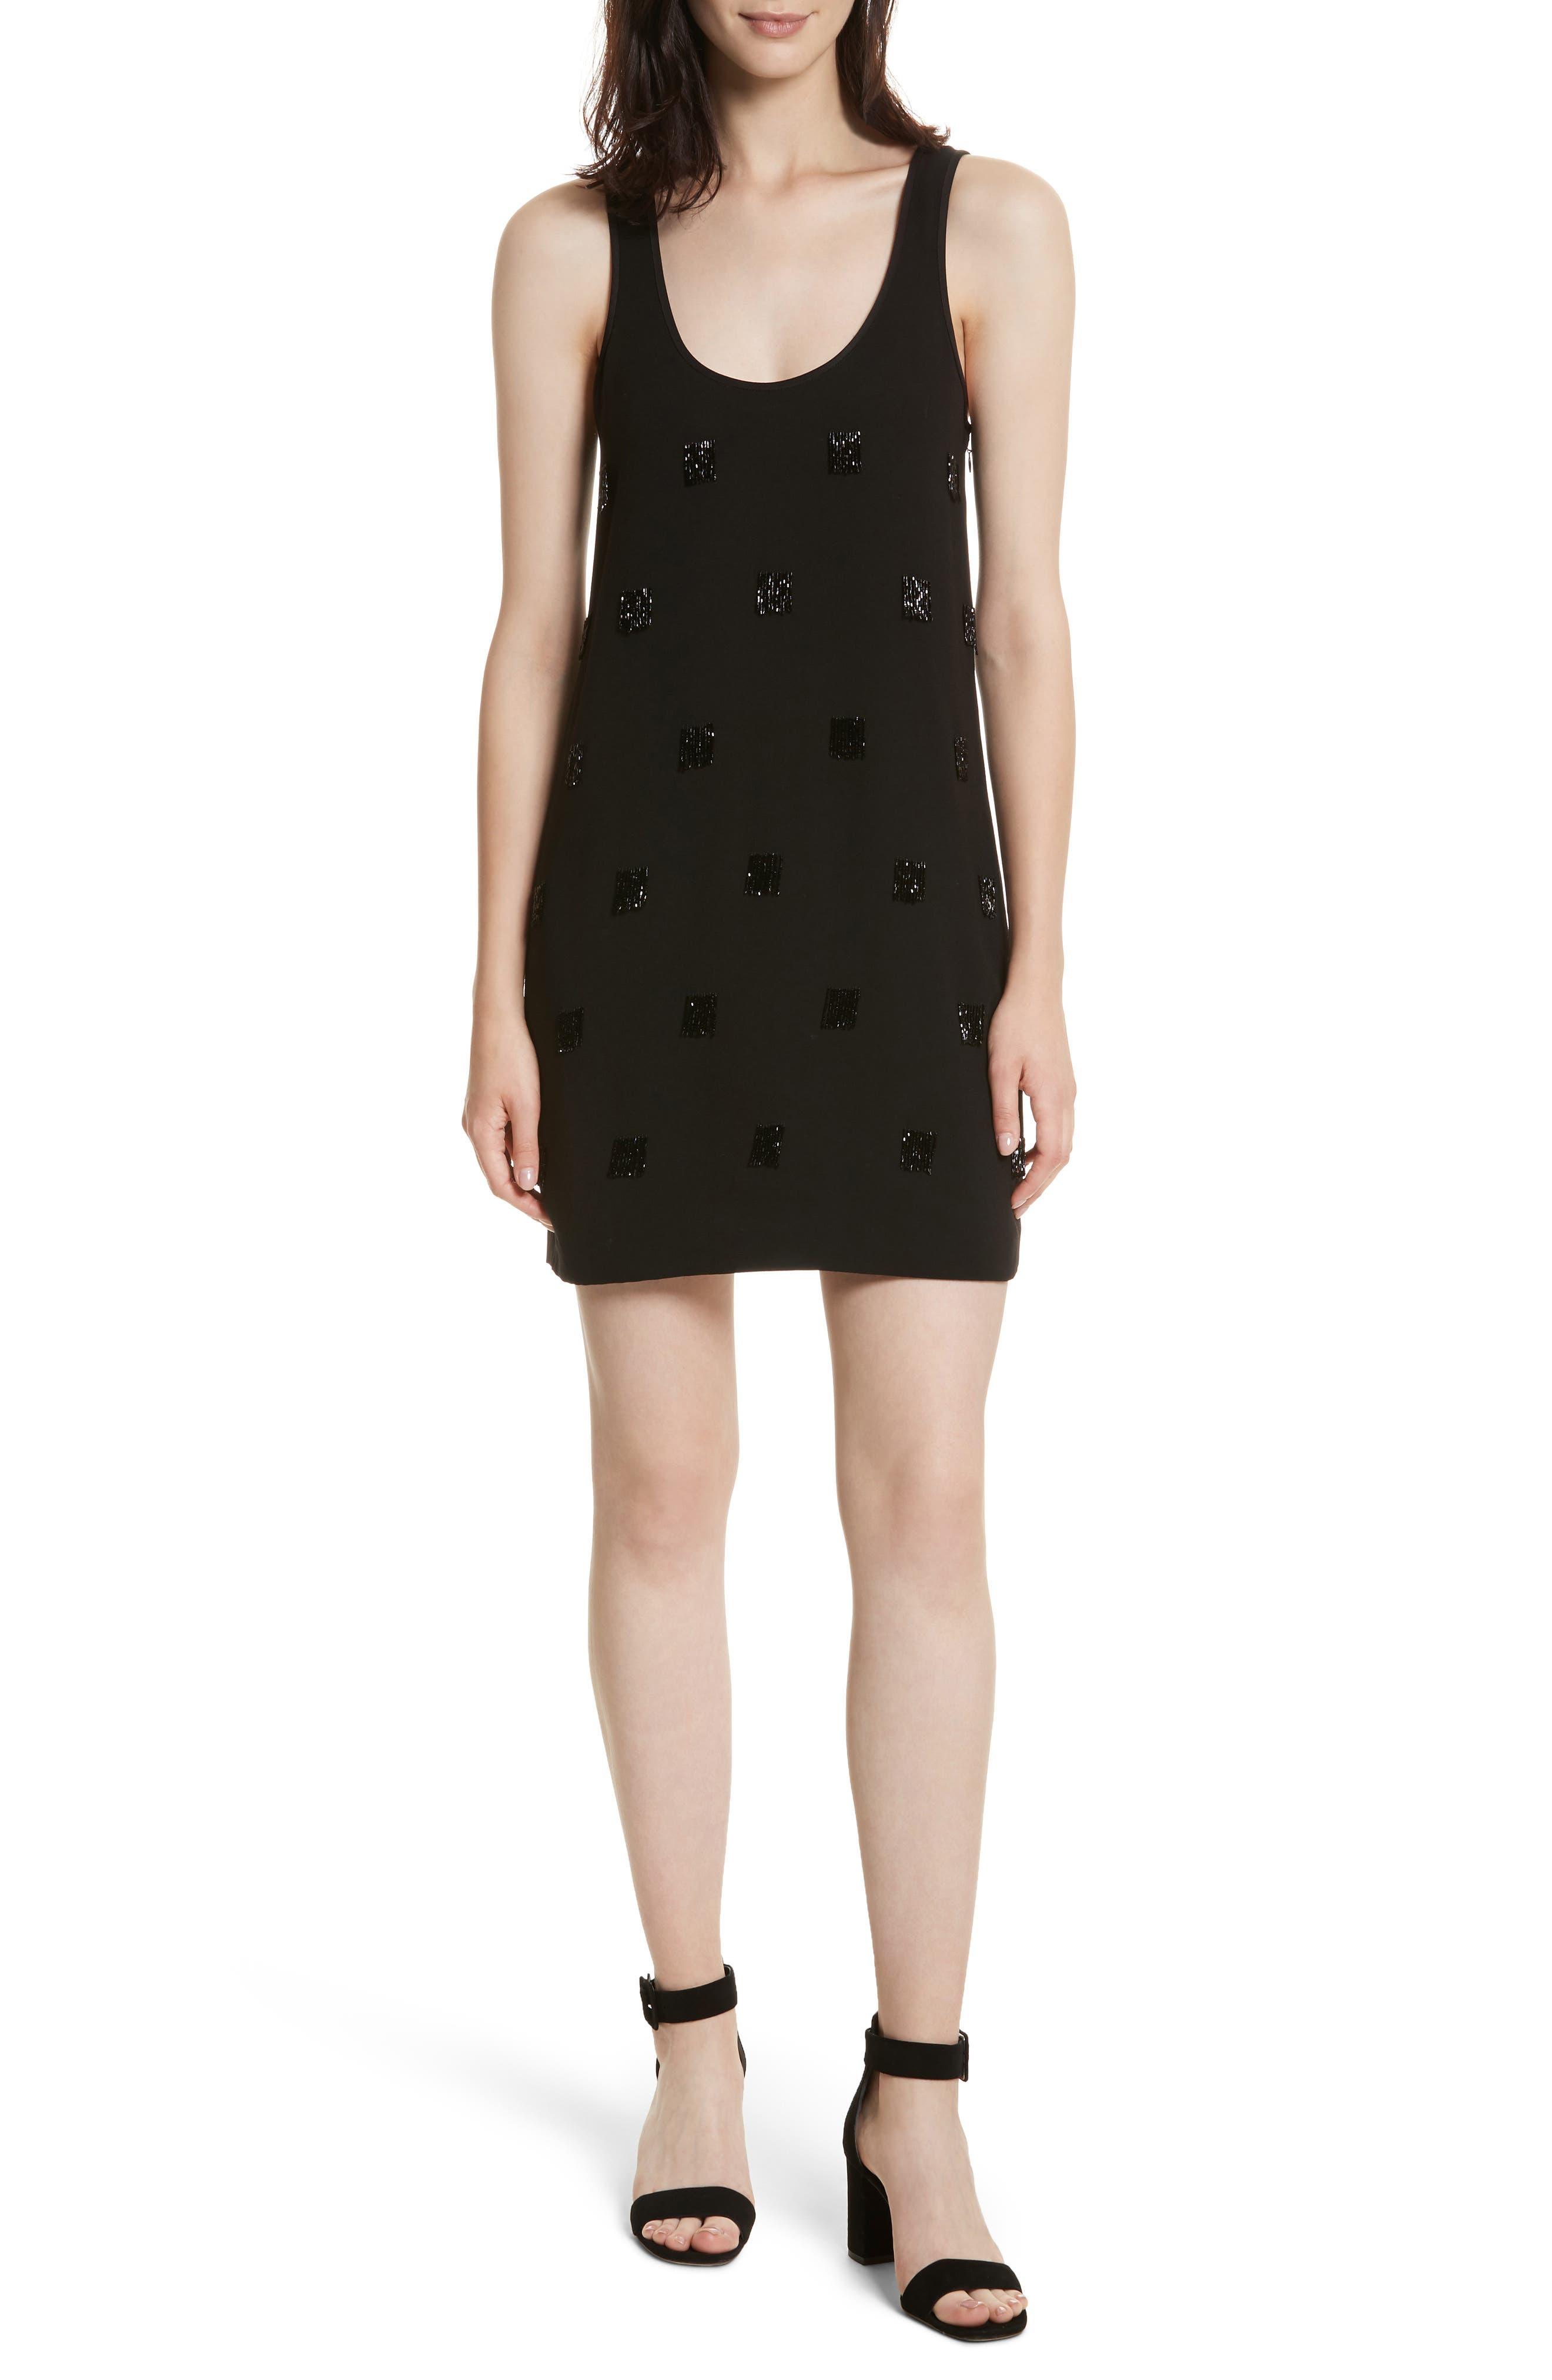 Greene Beaded Fringe Minidress,                             Main thumbnail 1, color,                             Black